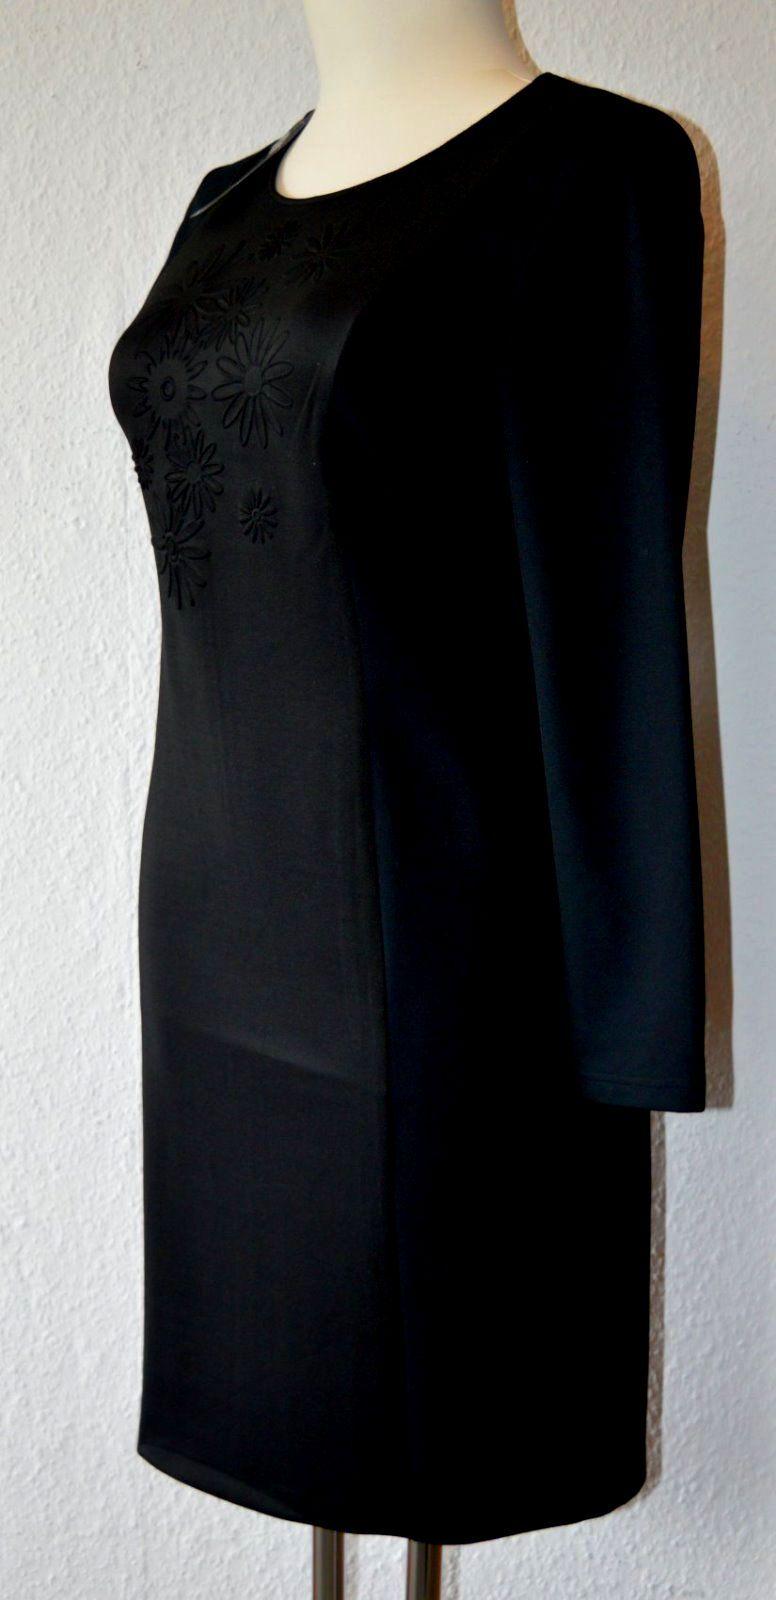 Gerry Weber SAMOON Damenkleid Größe 42 NEU